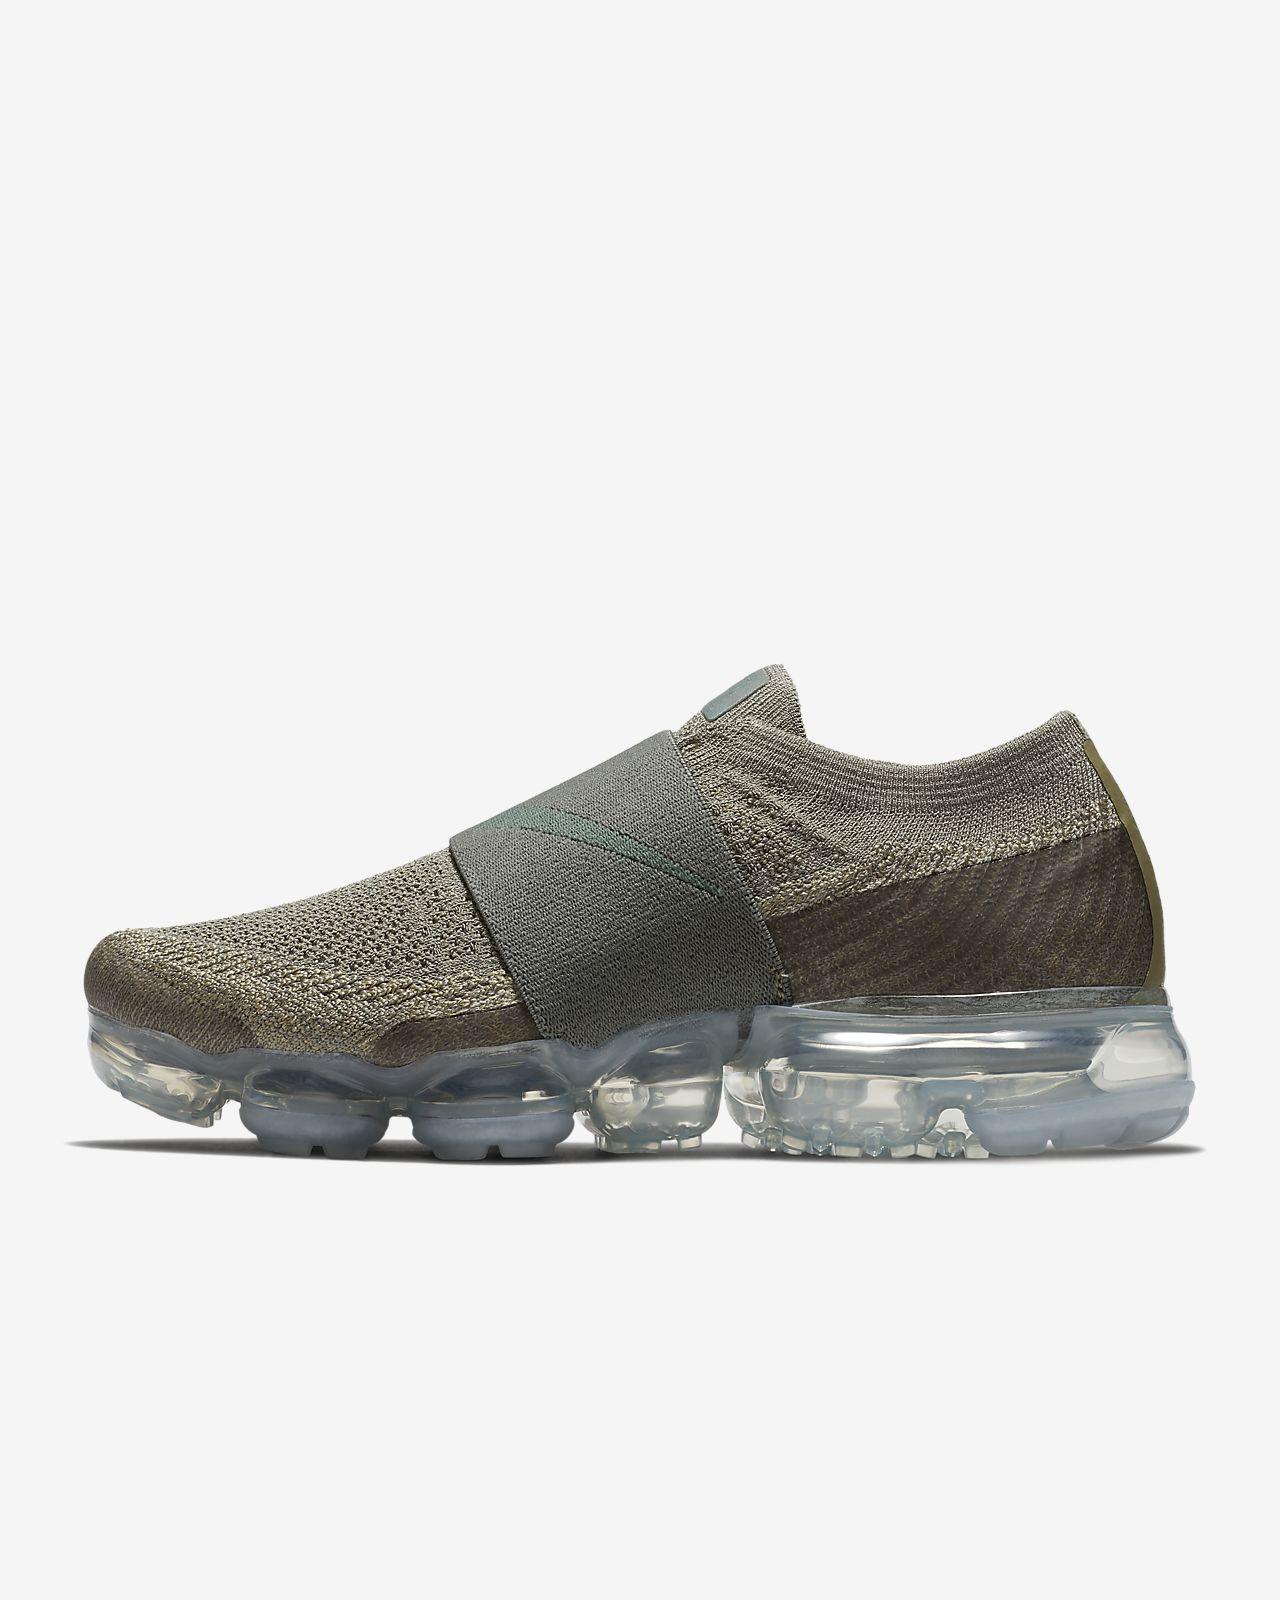 vapormax nike scarpe